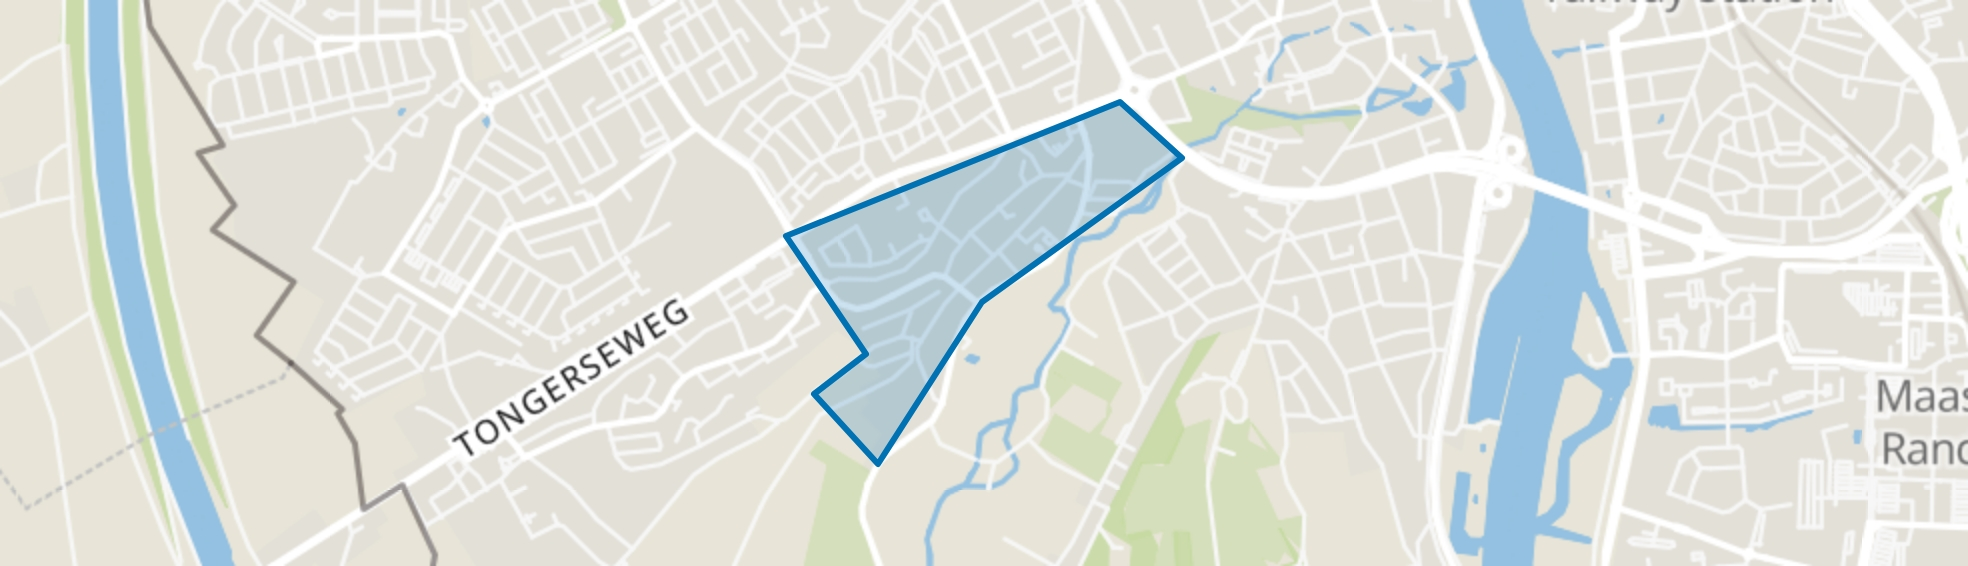 Biesland, Maastricht map